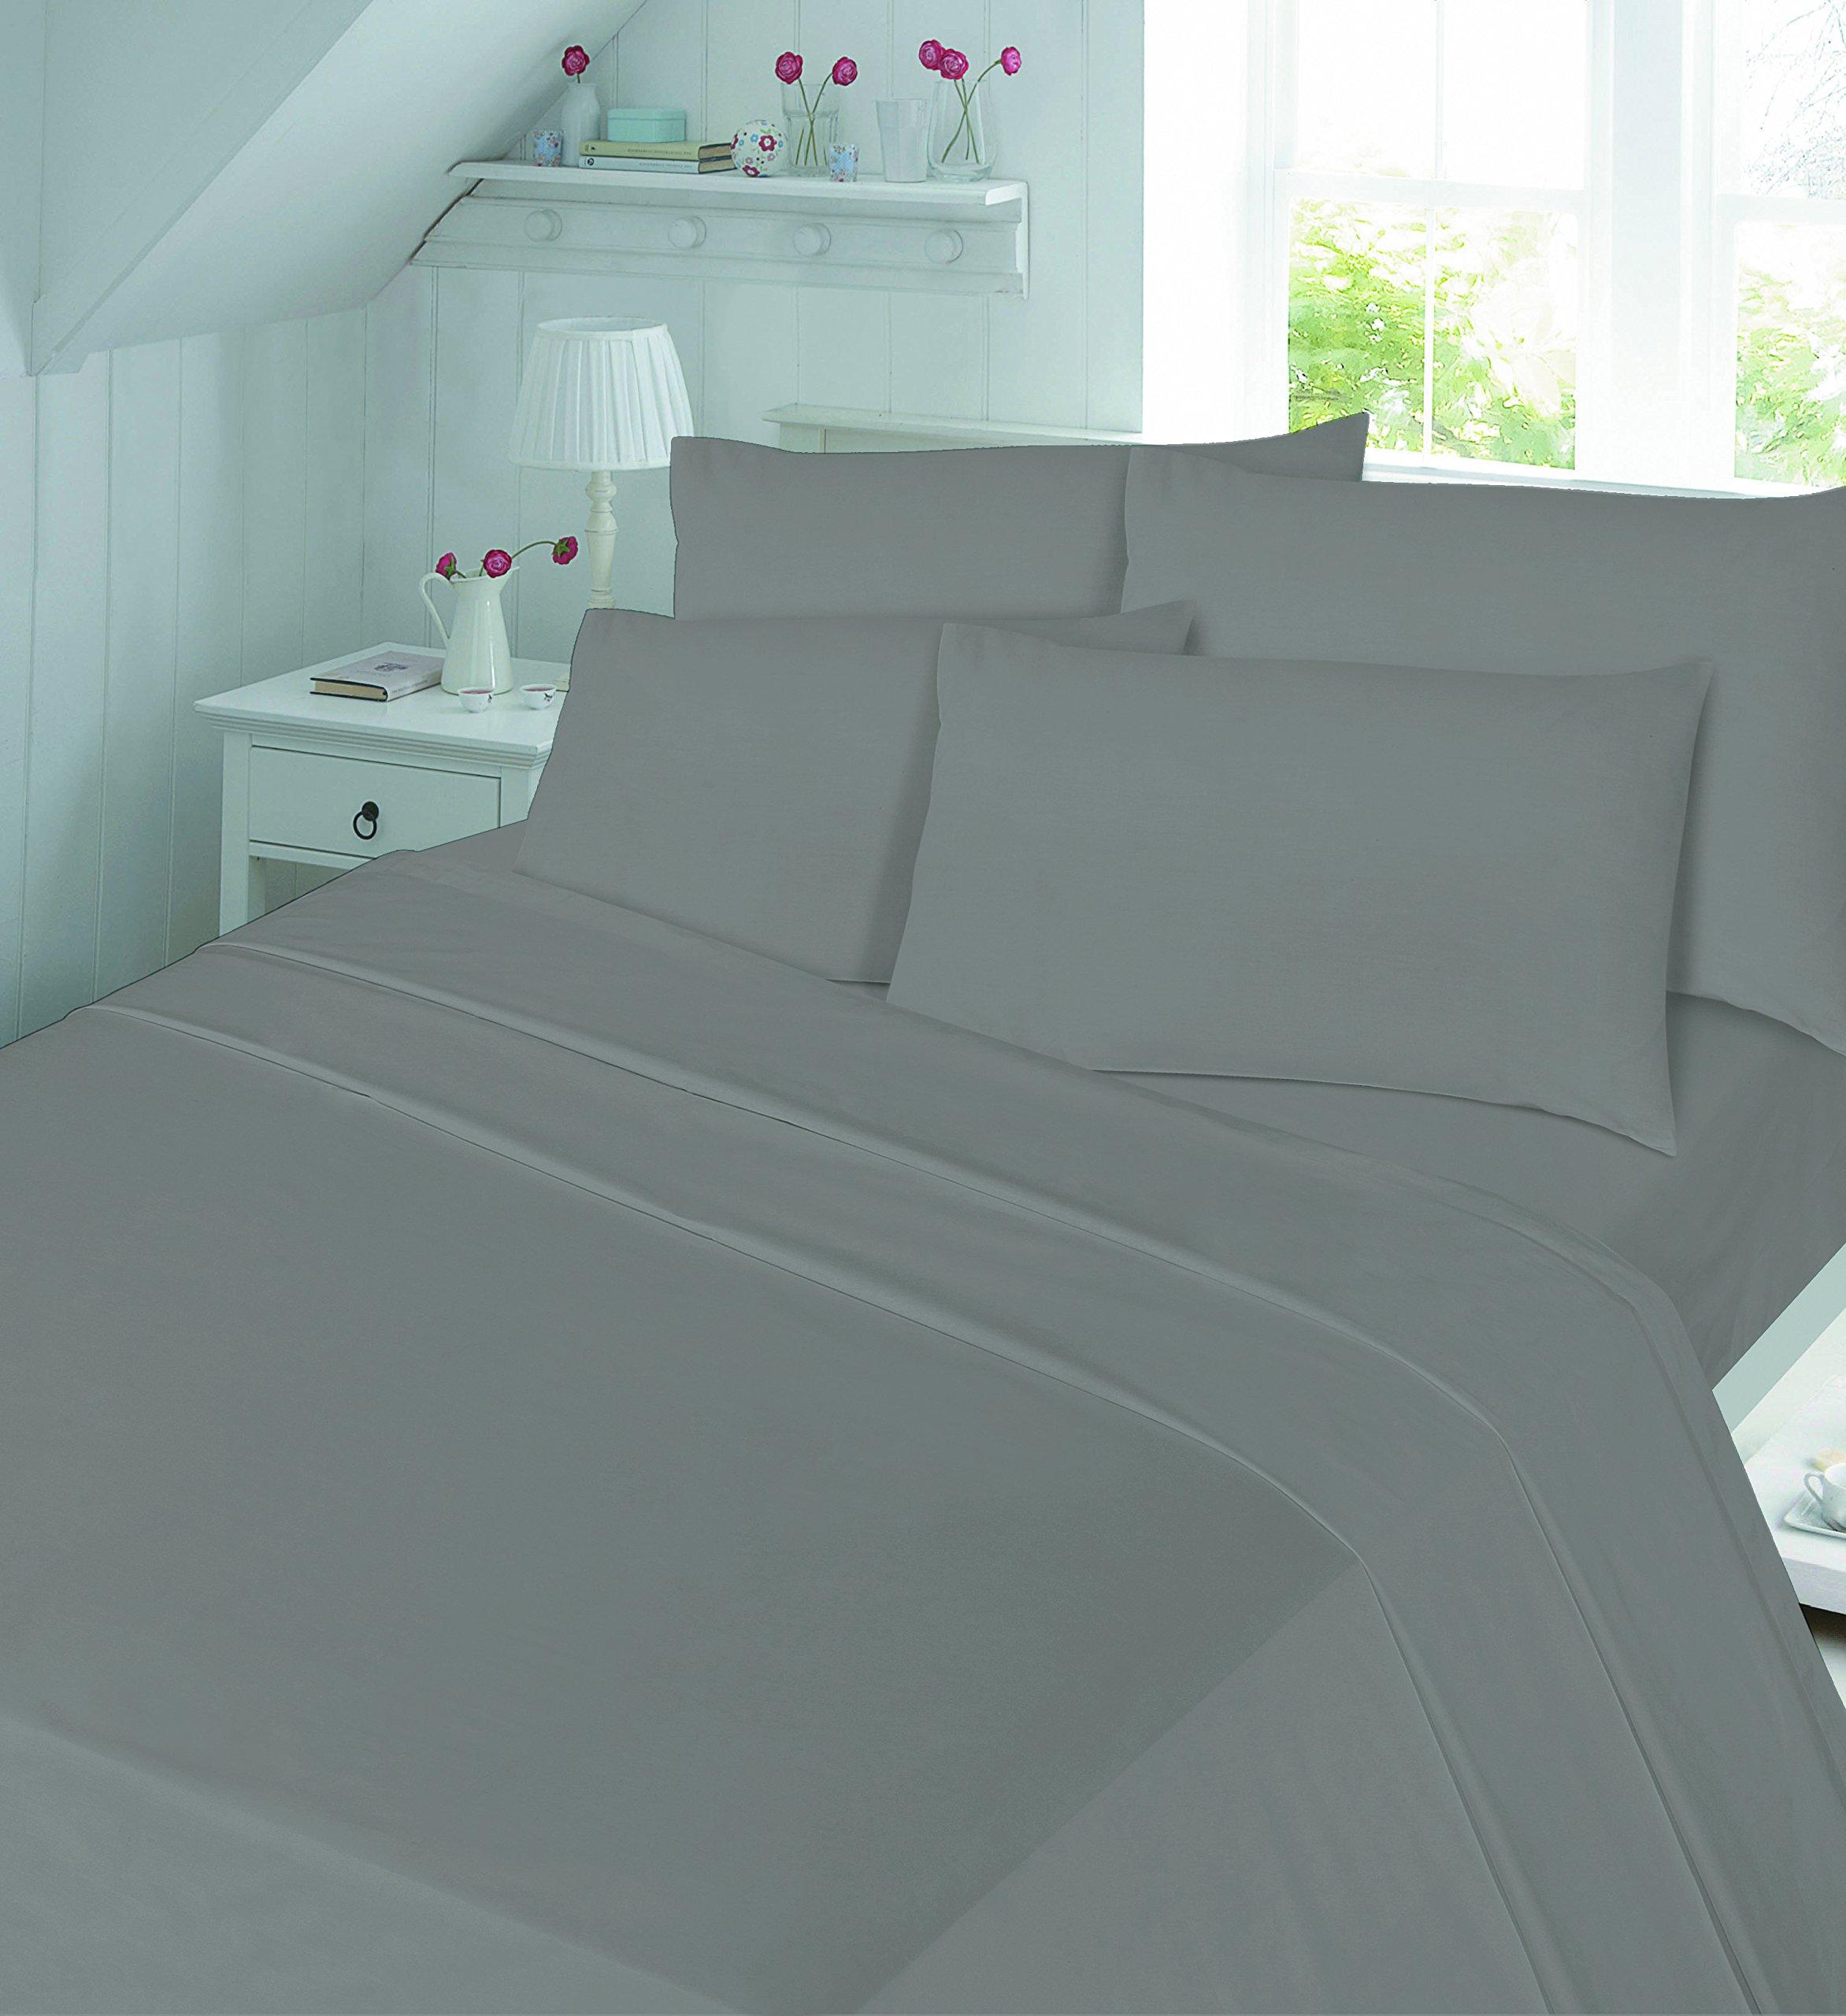 Nz Luxury Soft 100 Brushed Cotton Flannelette Flat Sheet Single Double And King Sizes King Grey Amazon Co Uk Kitchen Home